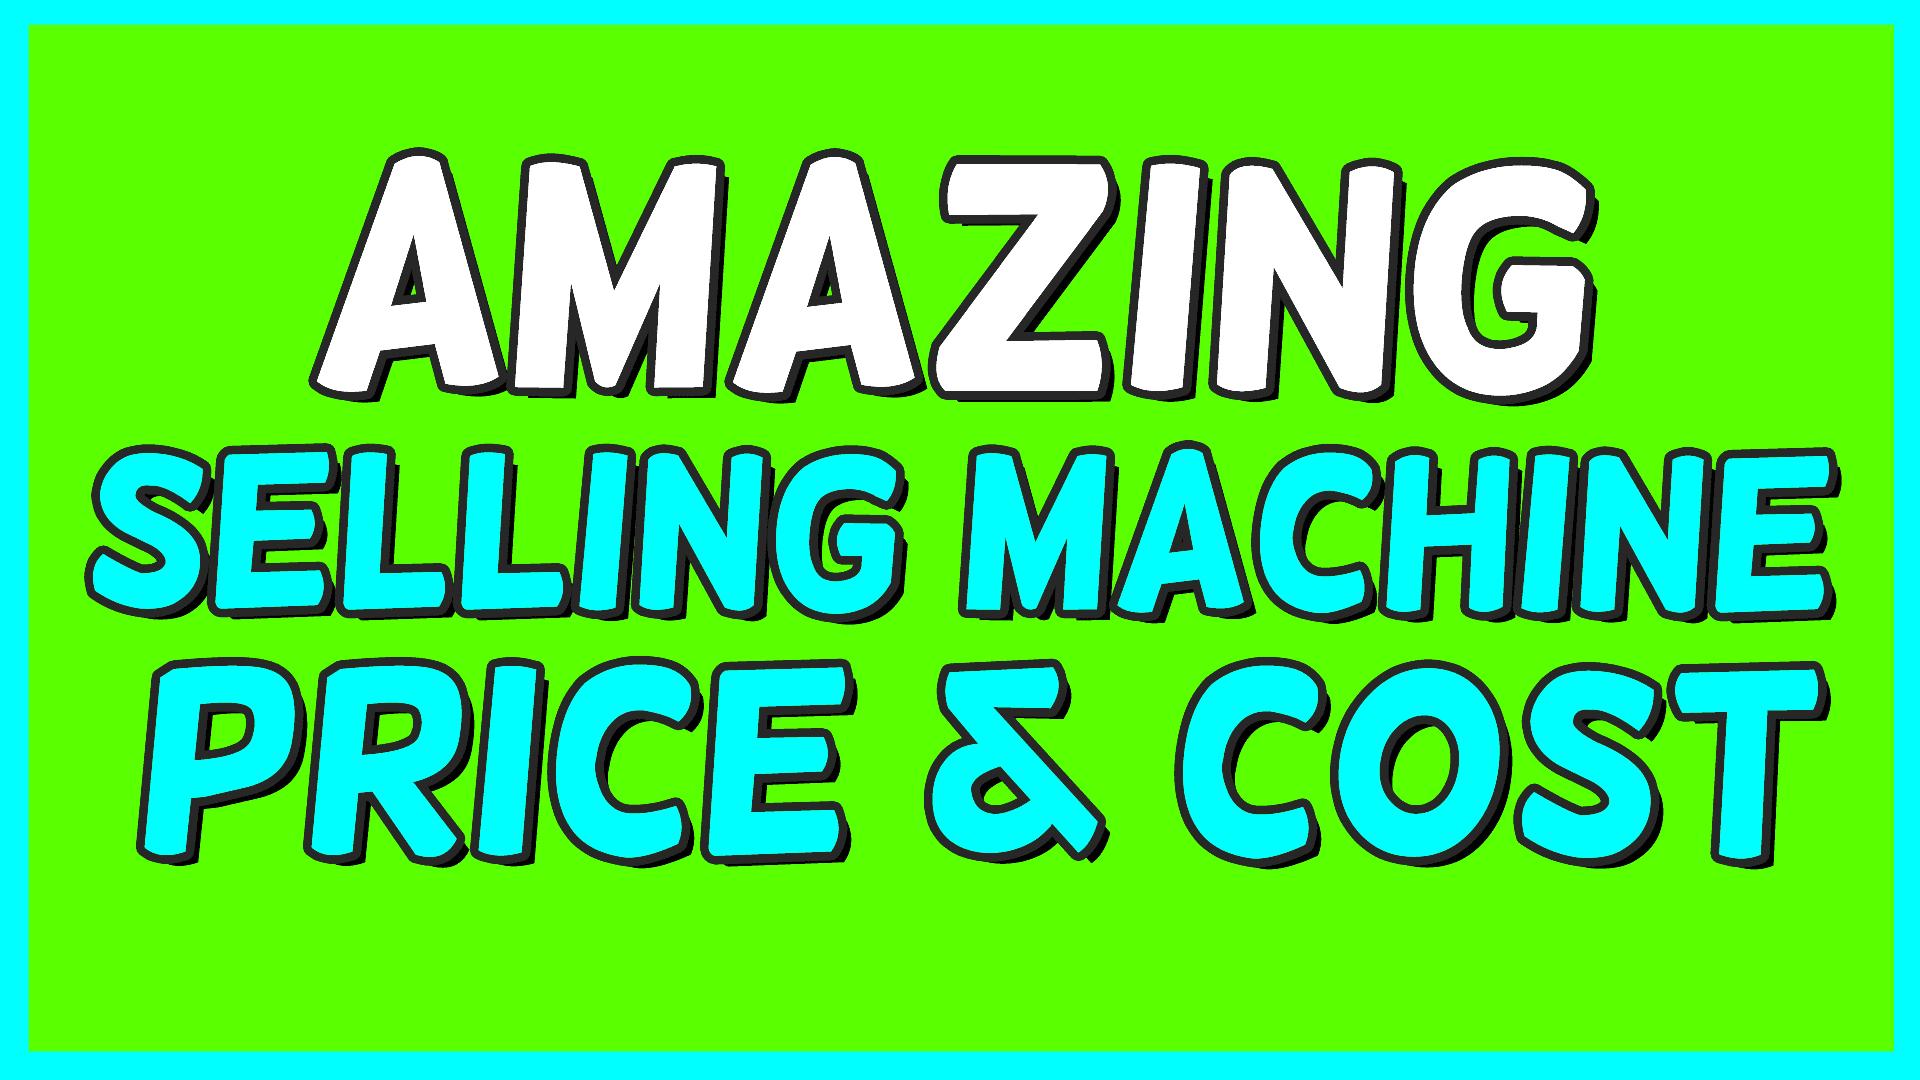 amazing selling machine price cost